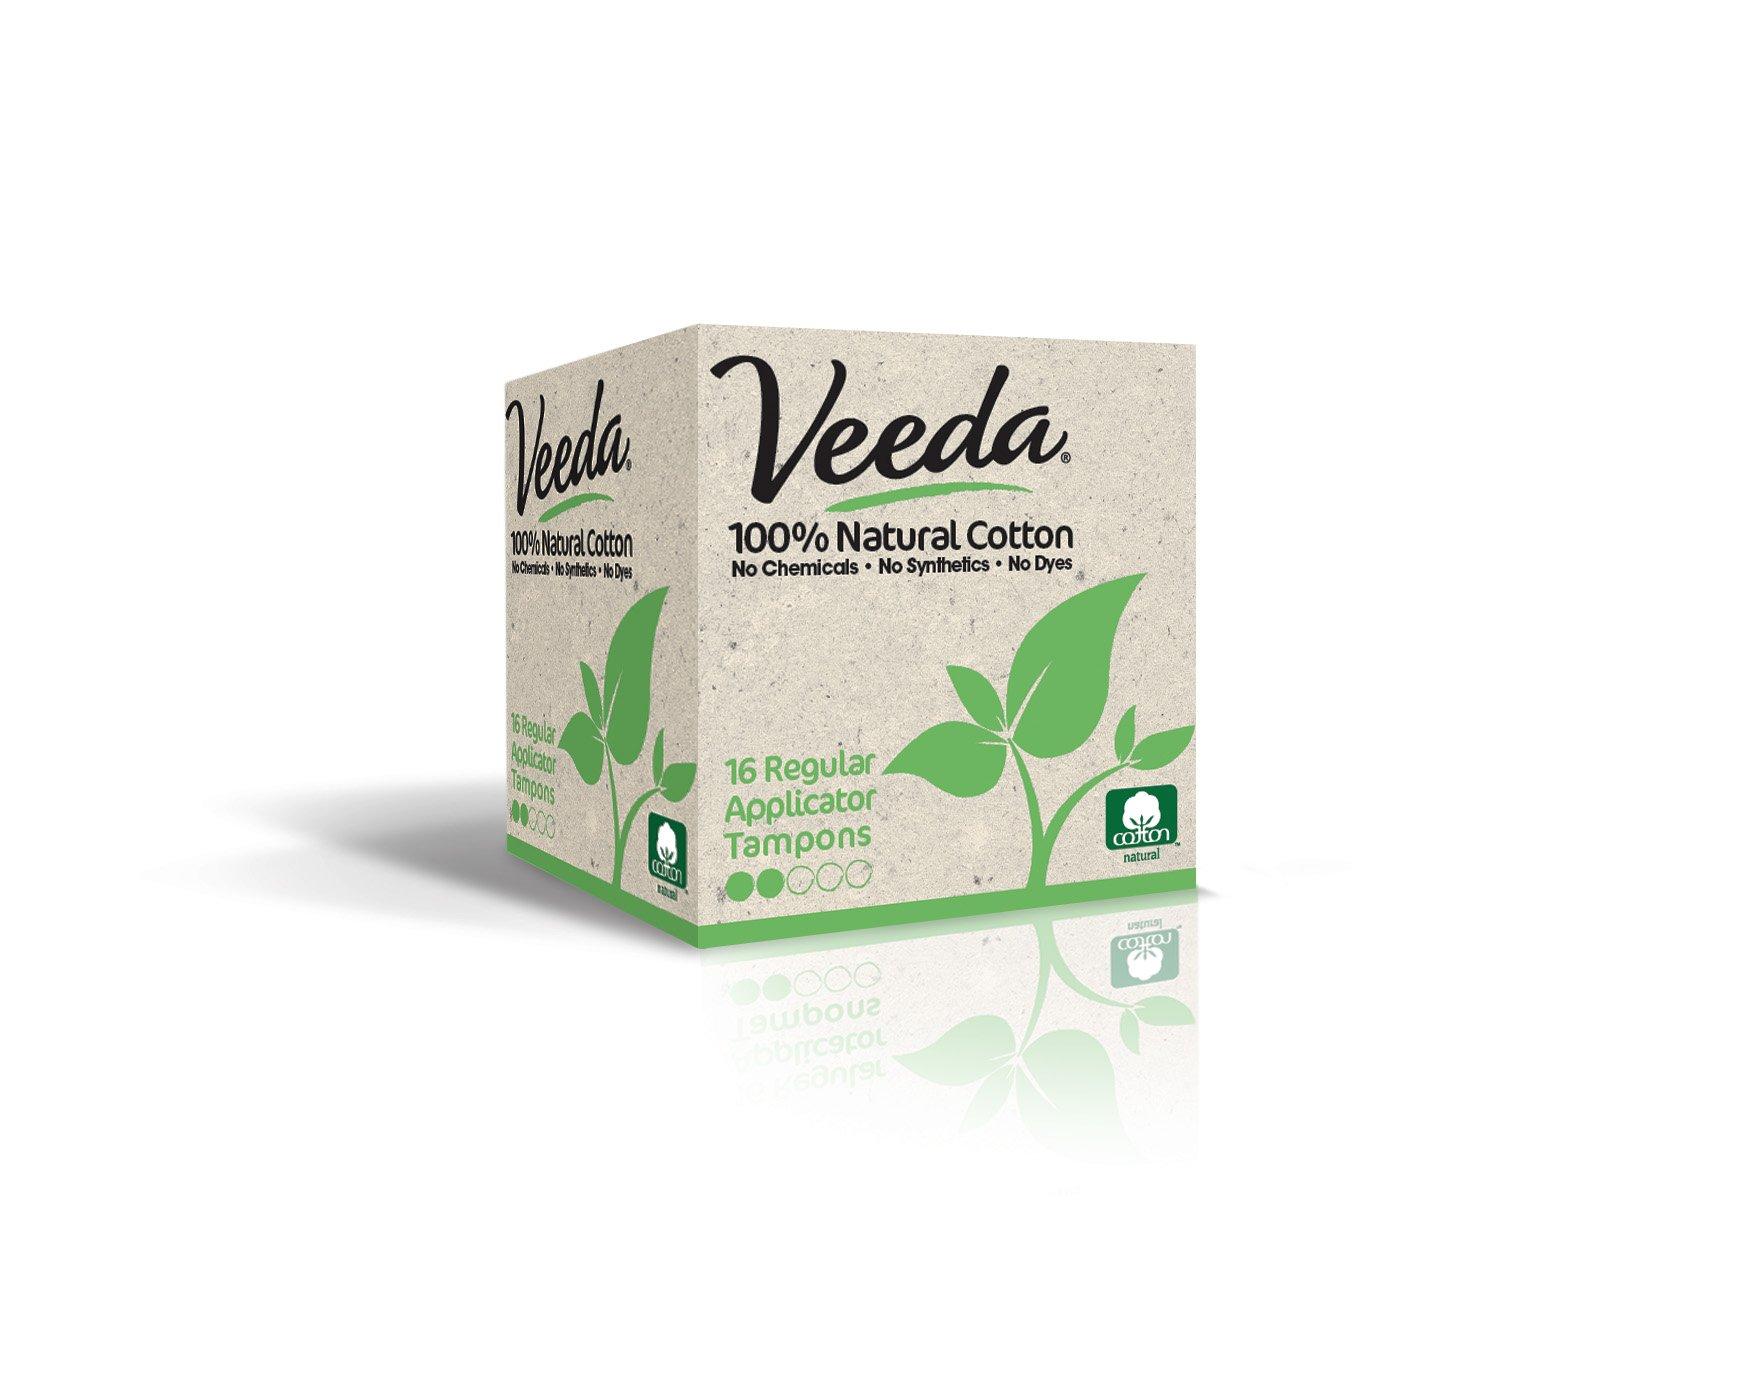 Veeda Natural All-Cotton Tampons, Regular, Compact Applicator, 16 Count